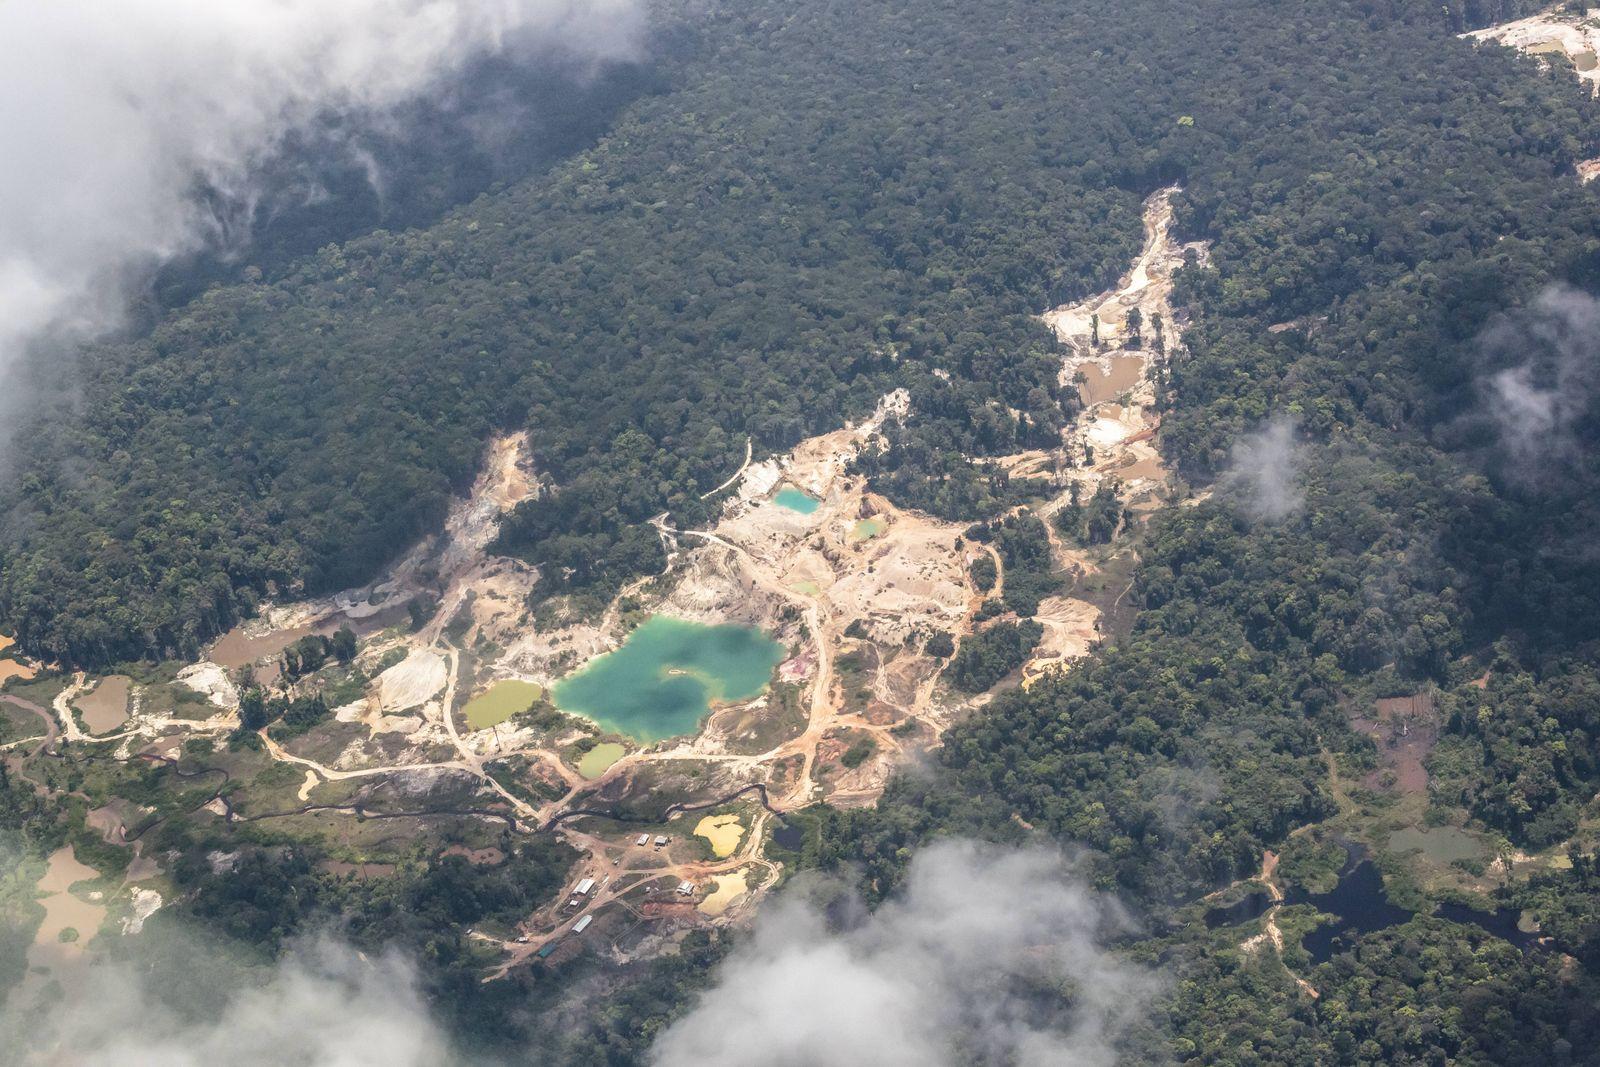 South America Guyana Kaieteur Falls Aerial view of gold mines PUBLICATIONxINxGERxSUIxAUTxONLY Co